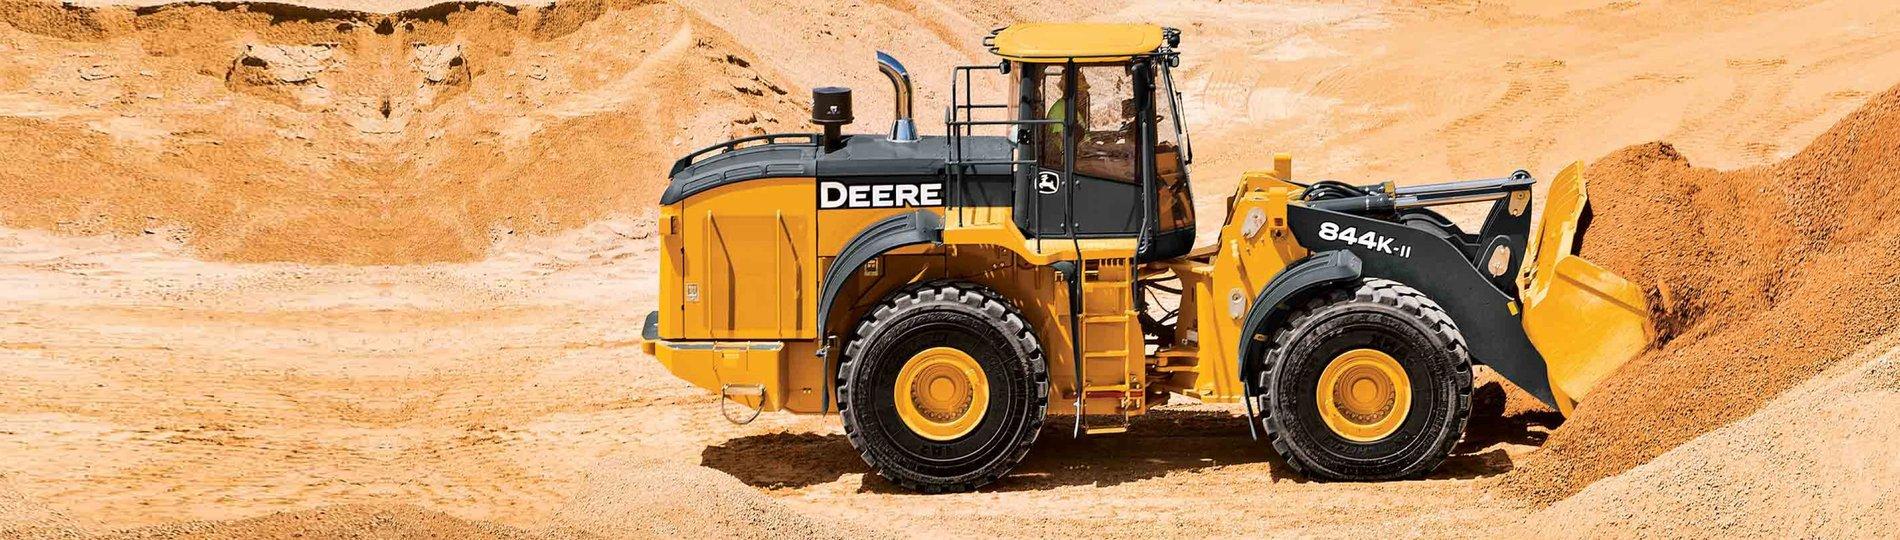 John Deere equipment is Verizon Connect ready